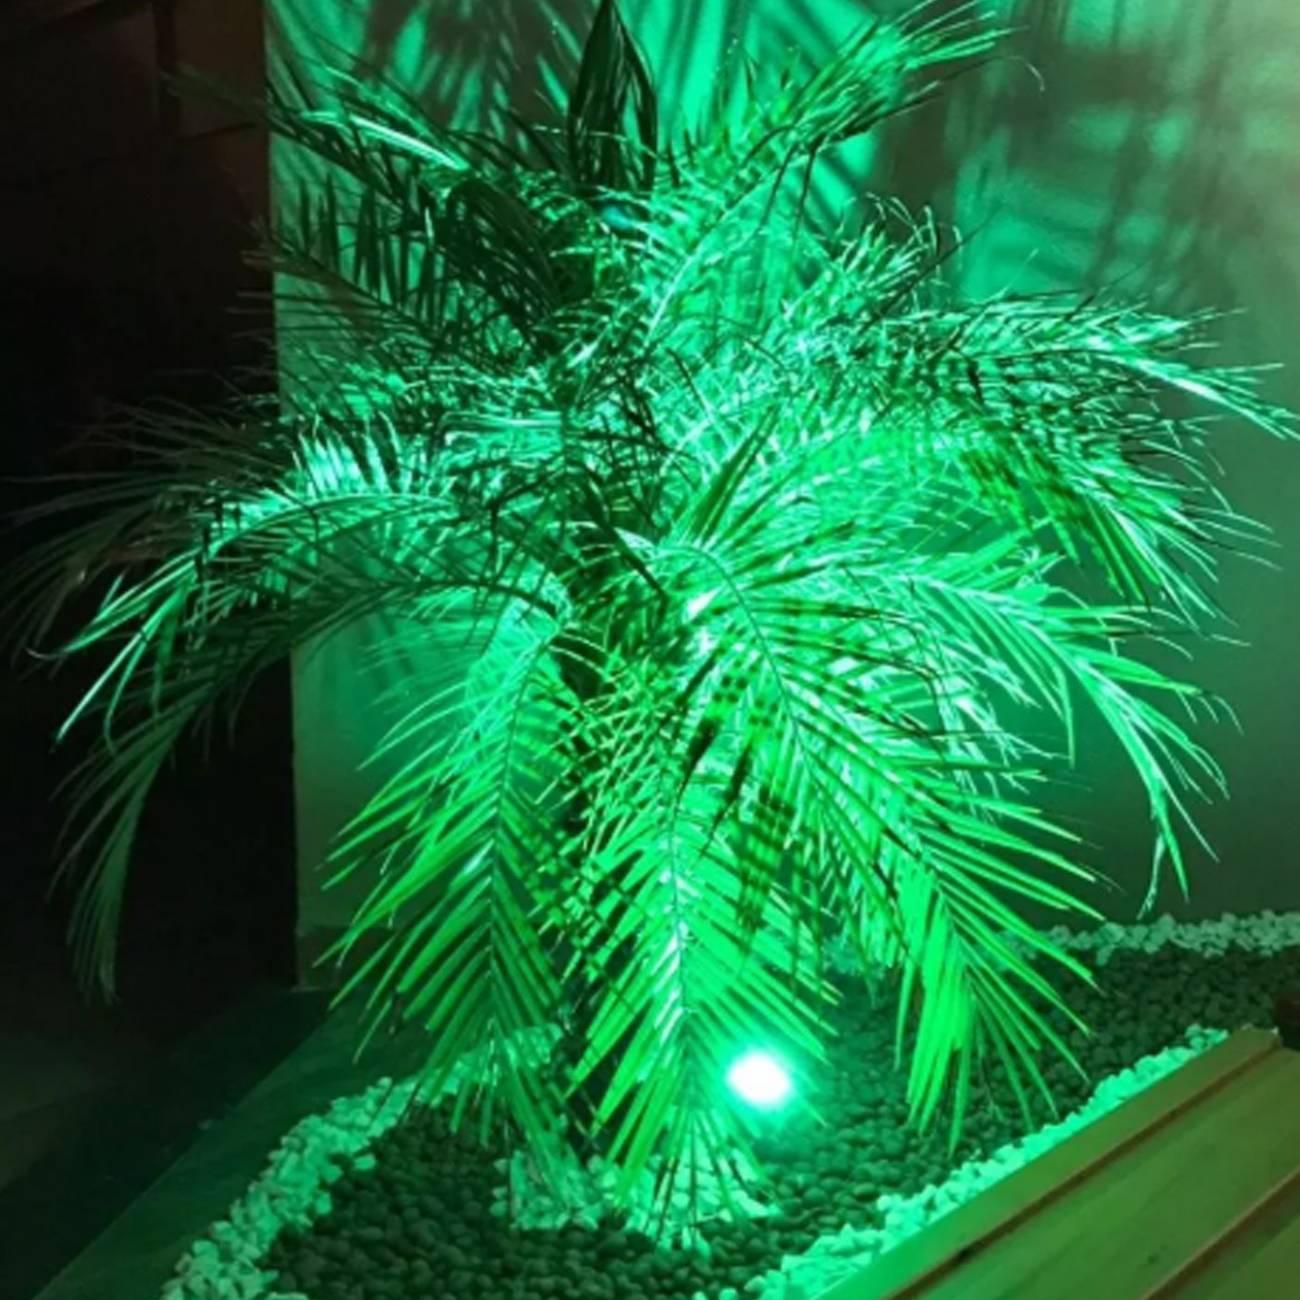 Espeto De Jardim Prova D'água Bivolt 3w Led Luz Verde - LCGELETRO